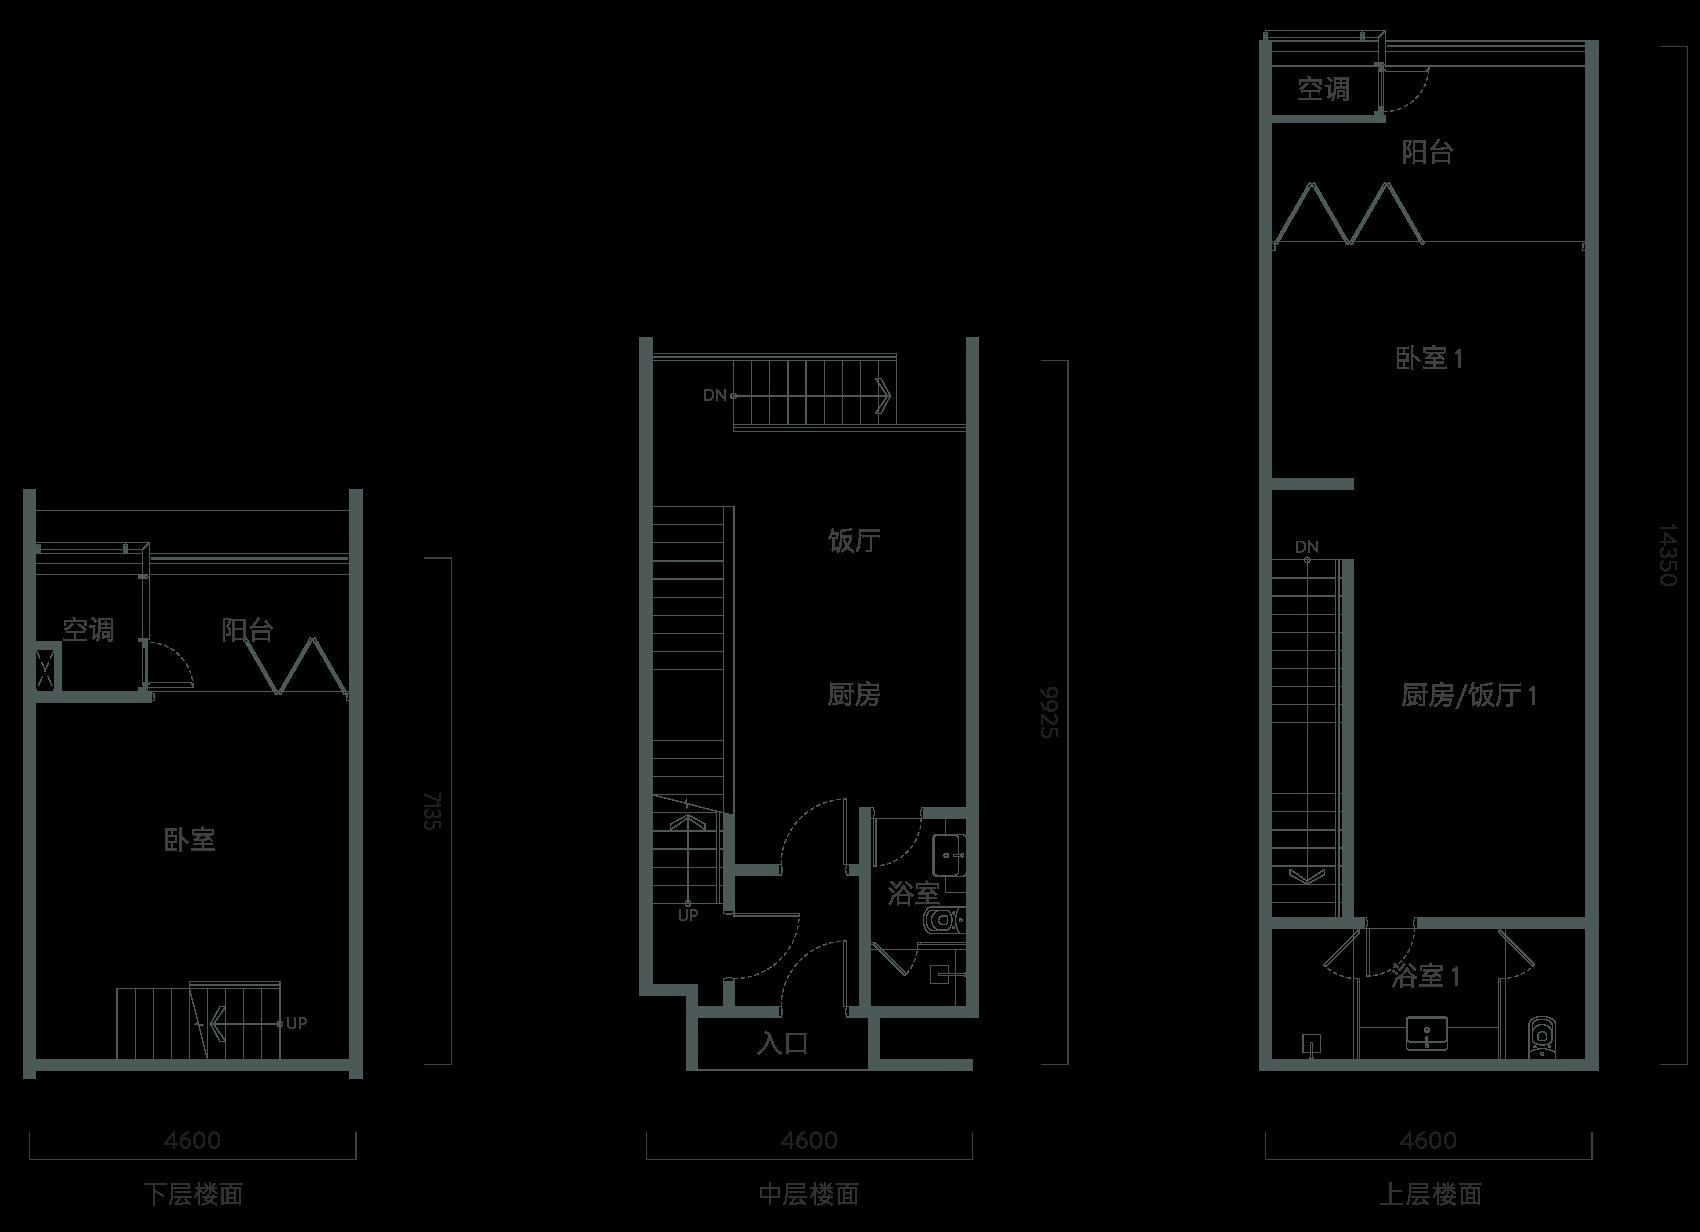 TS4a Floorplan